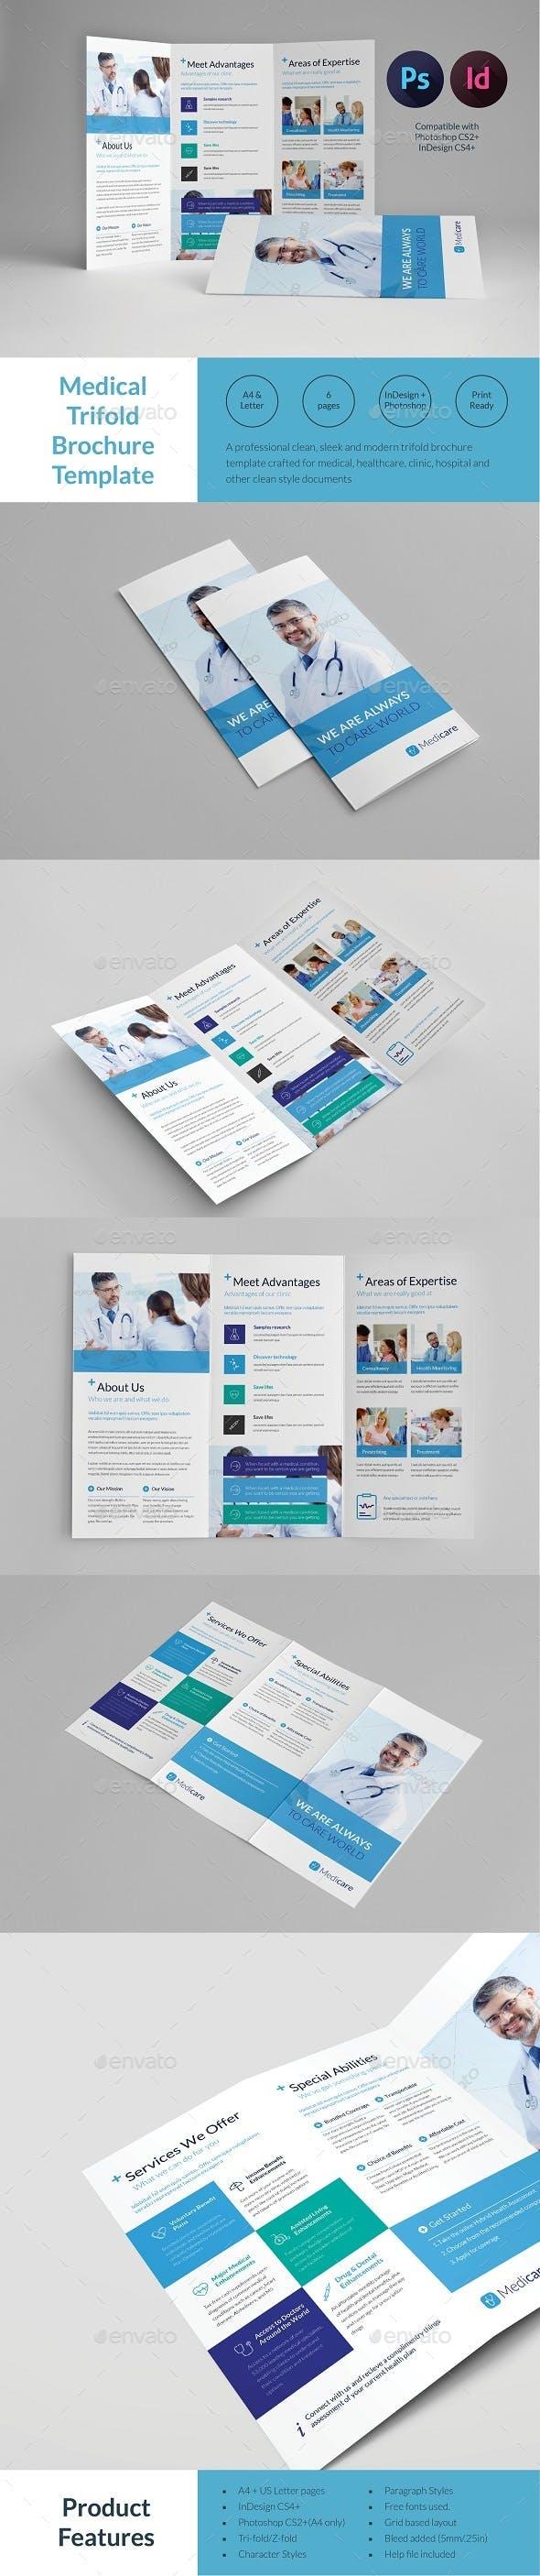 medical trifold brochure template informational brochures